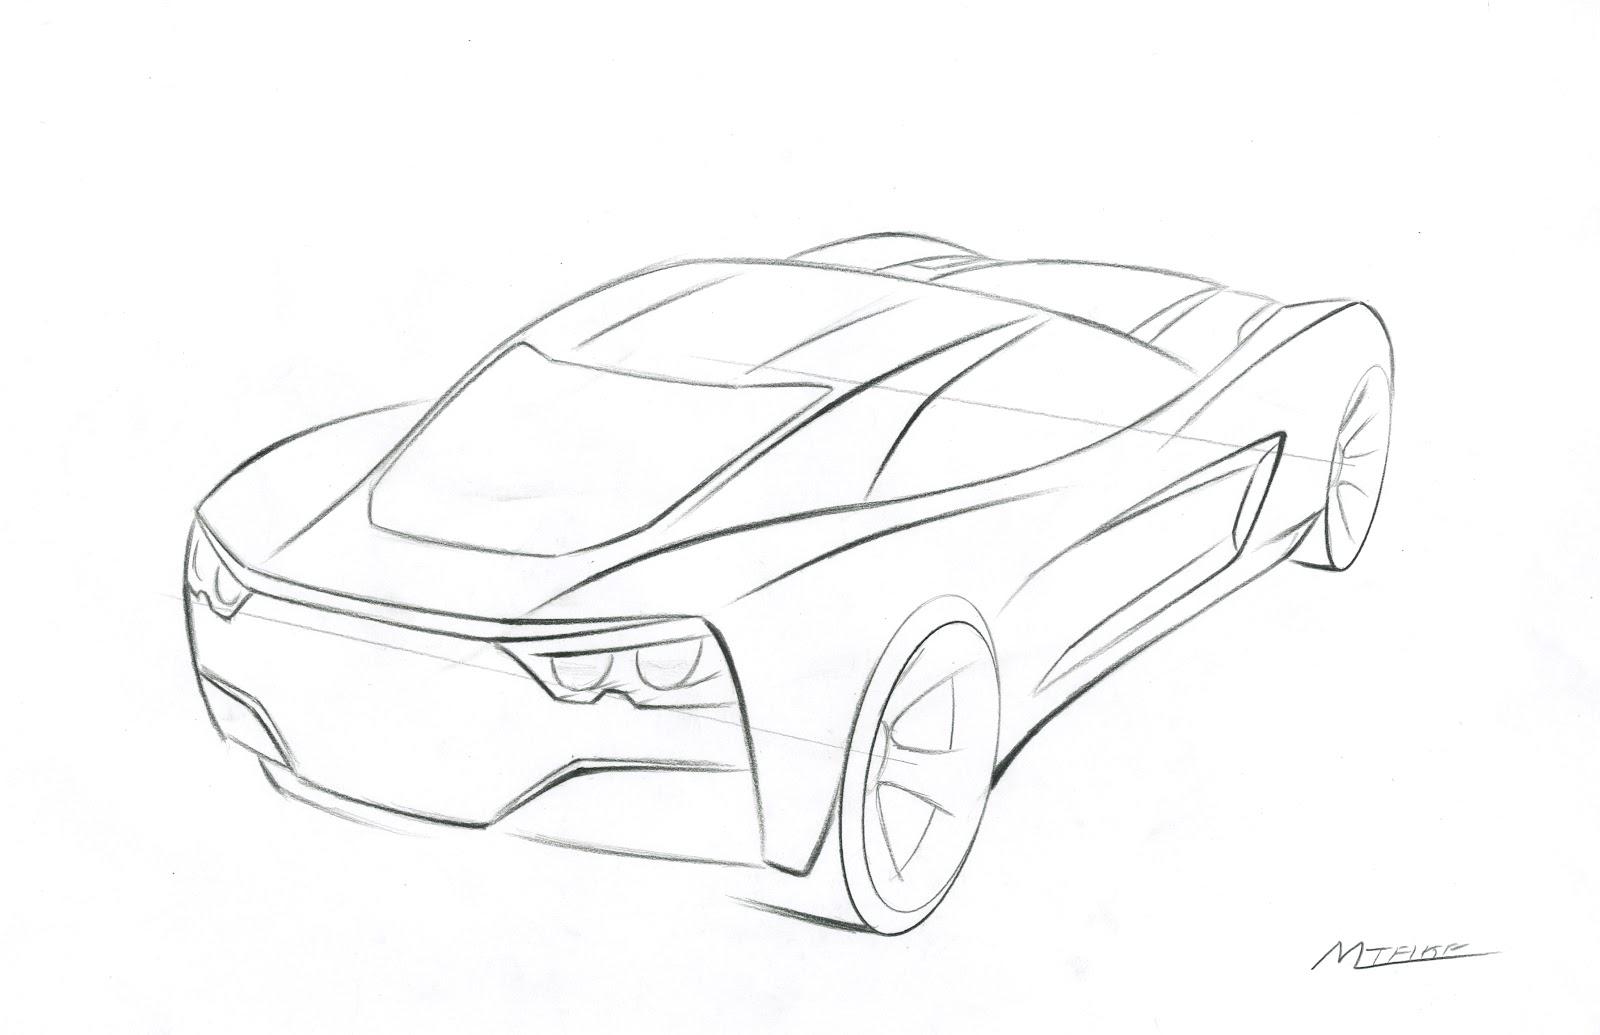 Corvet free coloring pages for Corvette car coloring pages